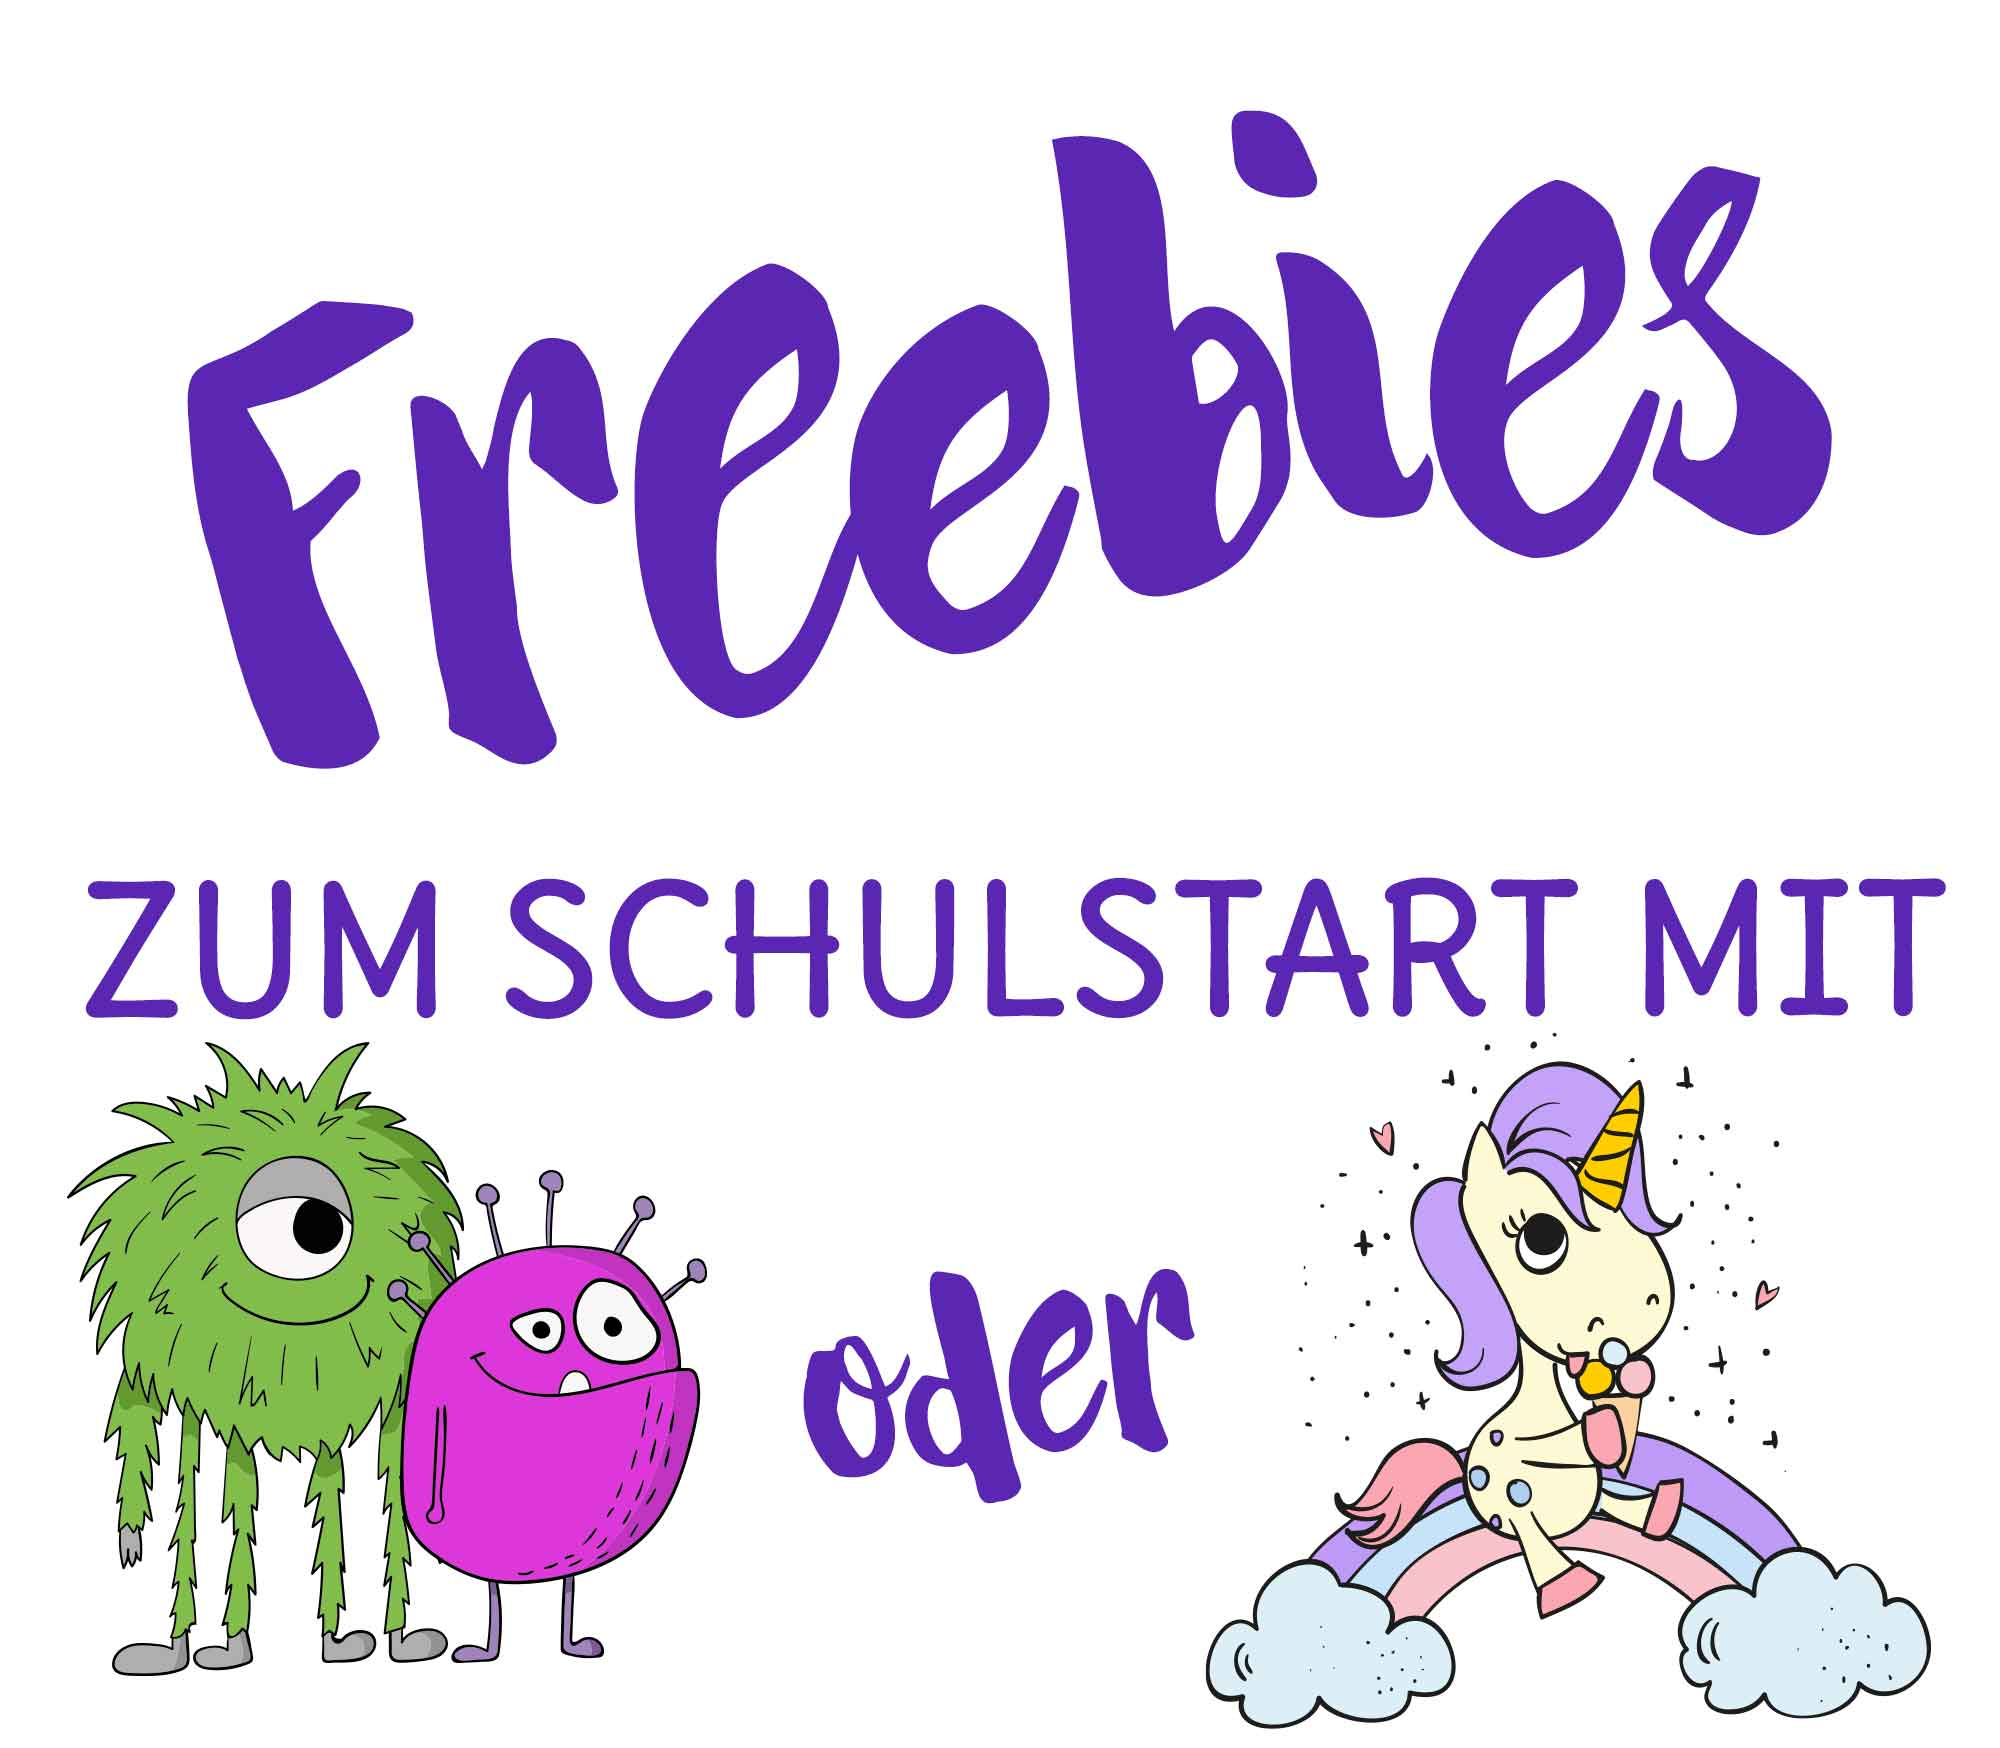 Freebies zum Schulstart